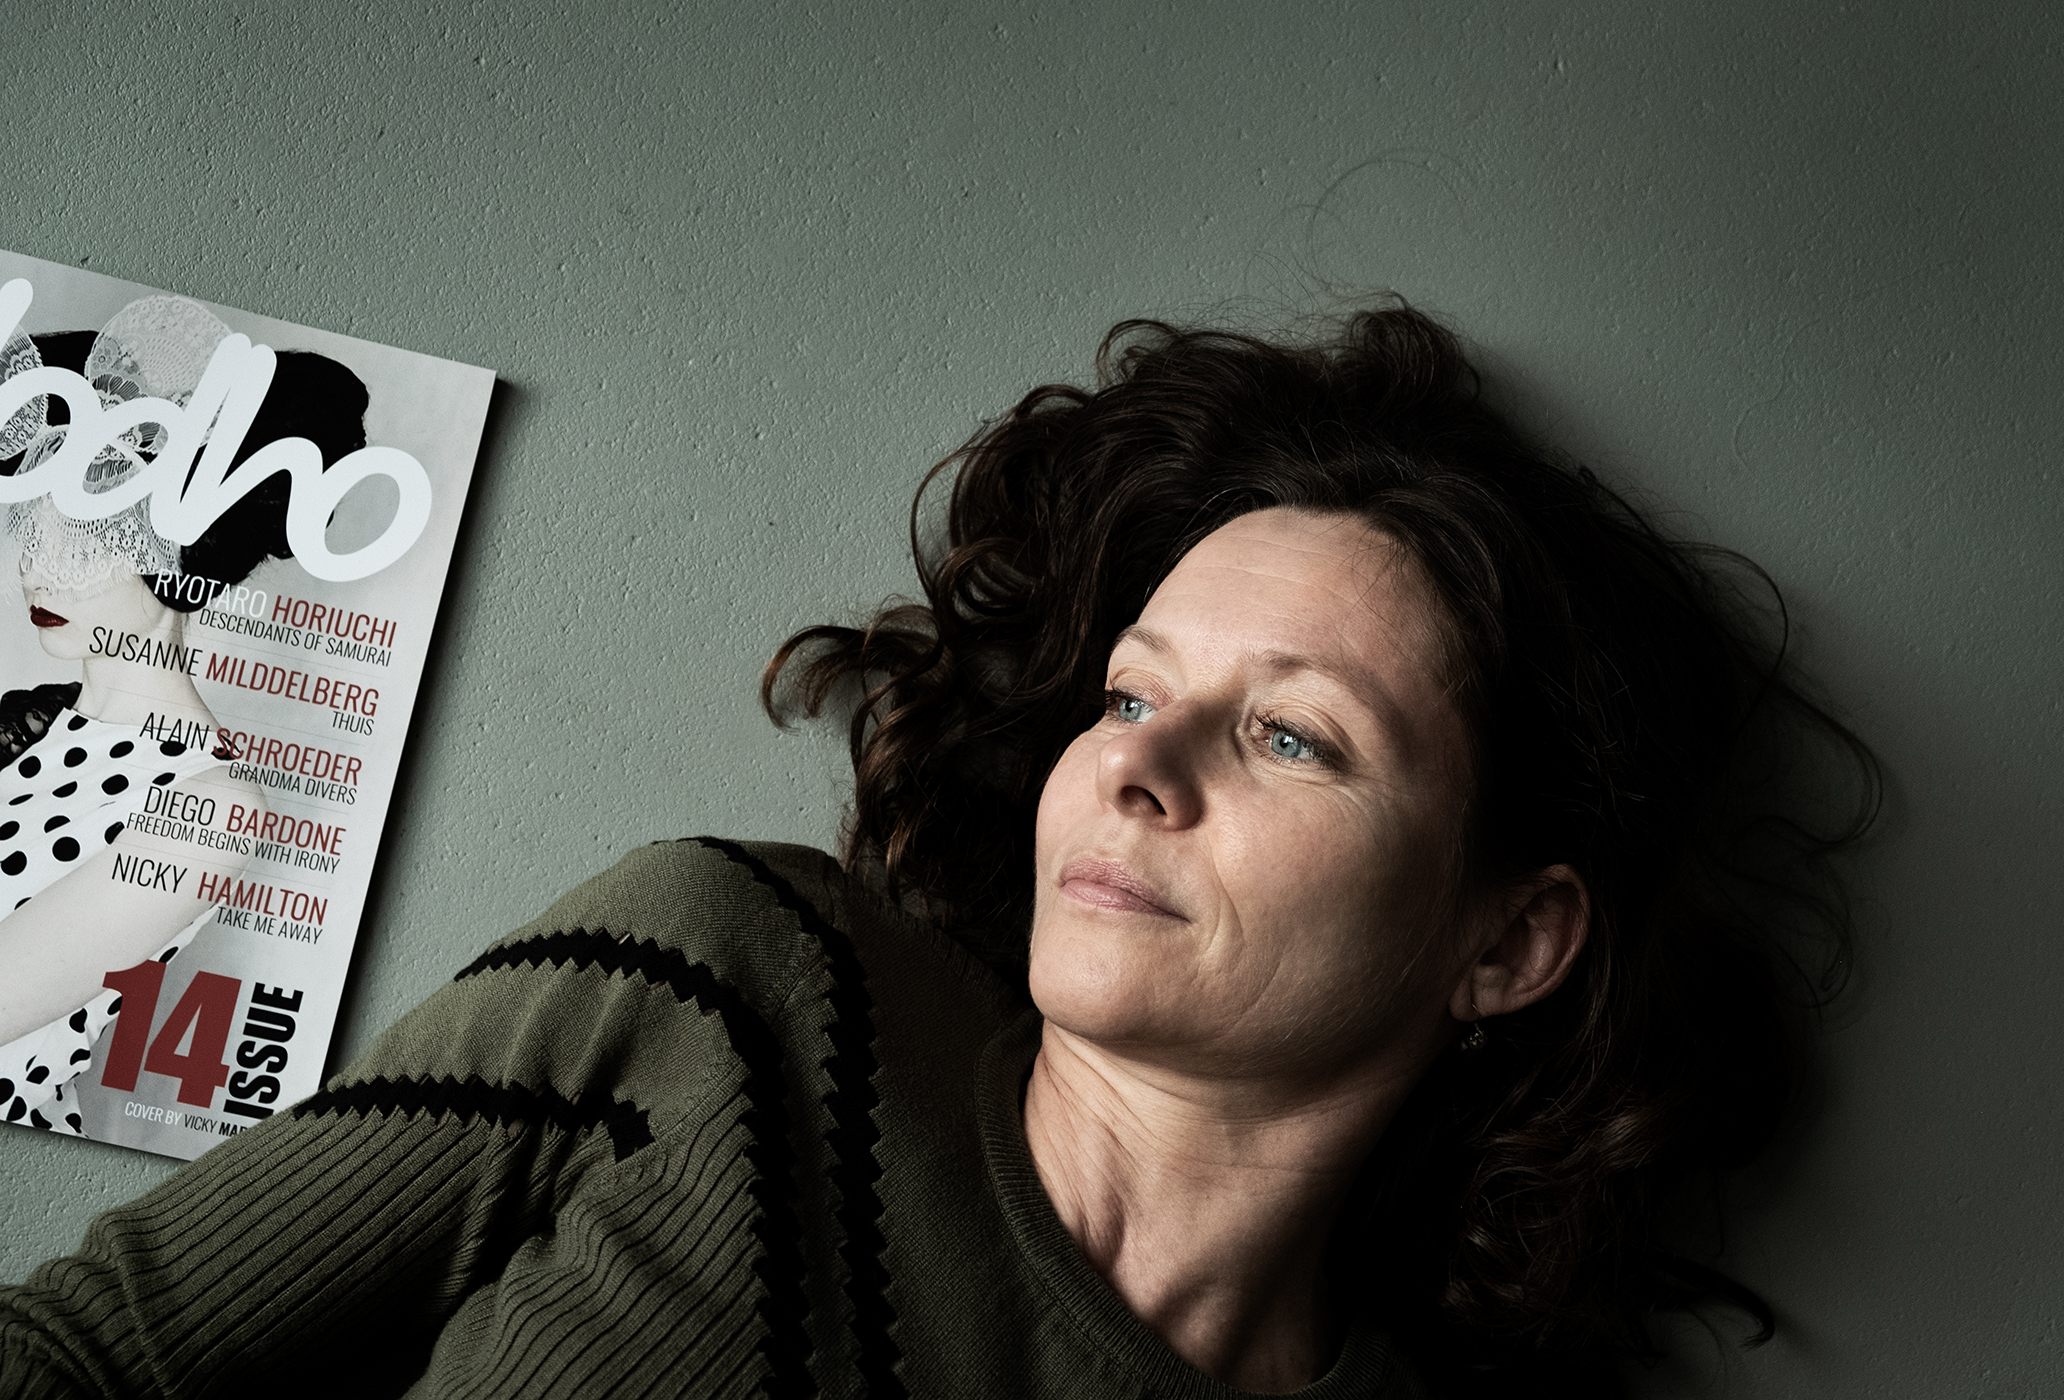 portret, portrait, portretfotografie, portraitphotography, Susanne Middelberg, Dodho Magazine